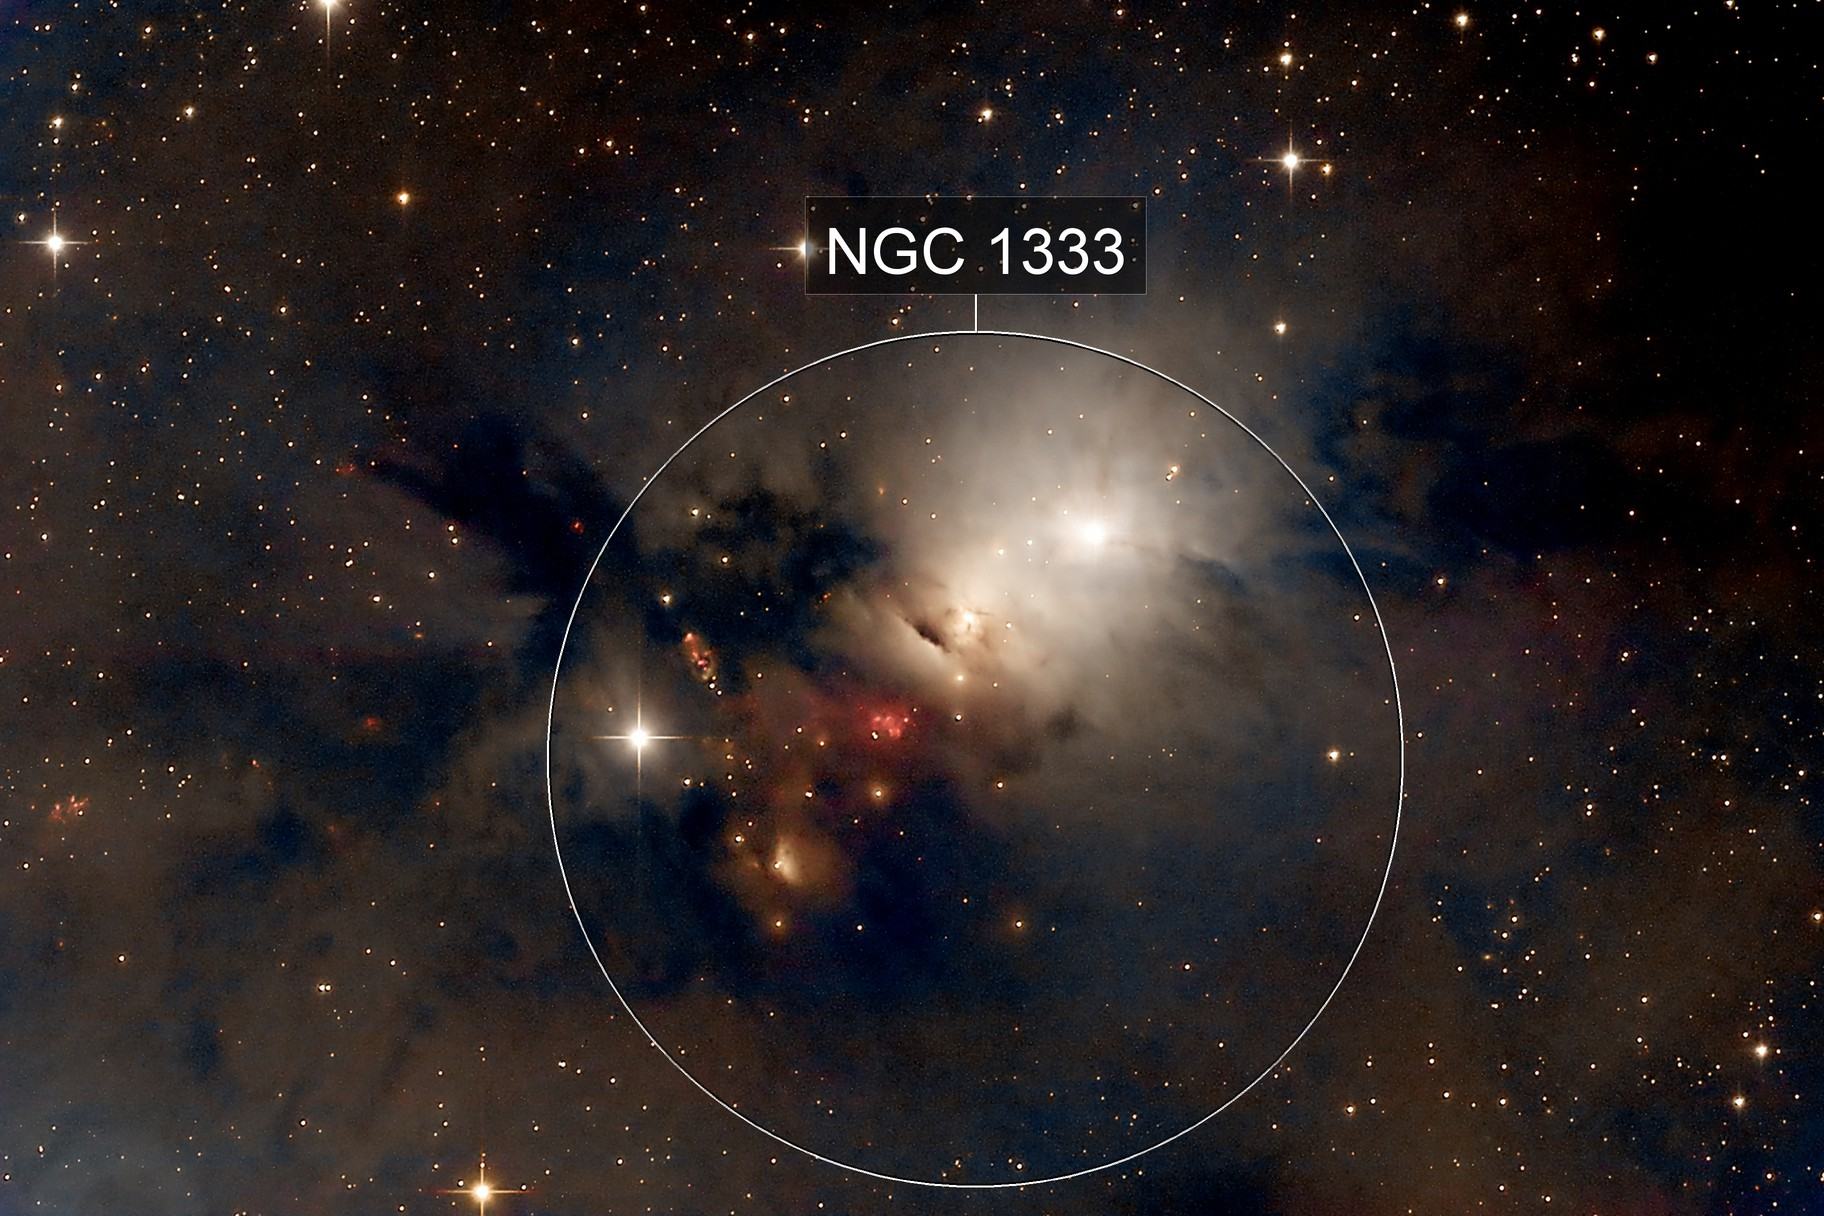 NGC 1333 - Embryo Nebula (LRGB)